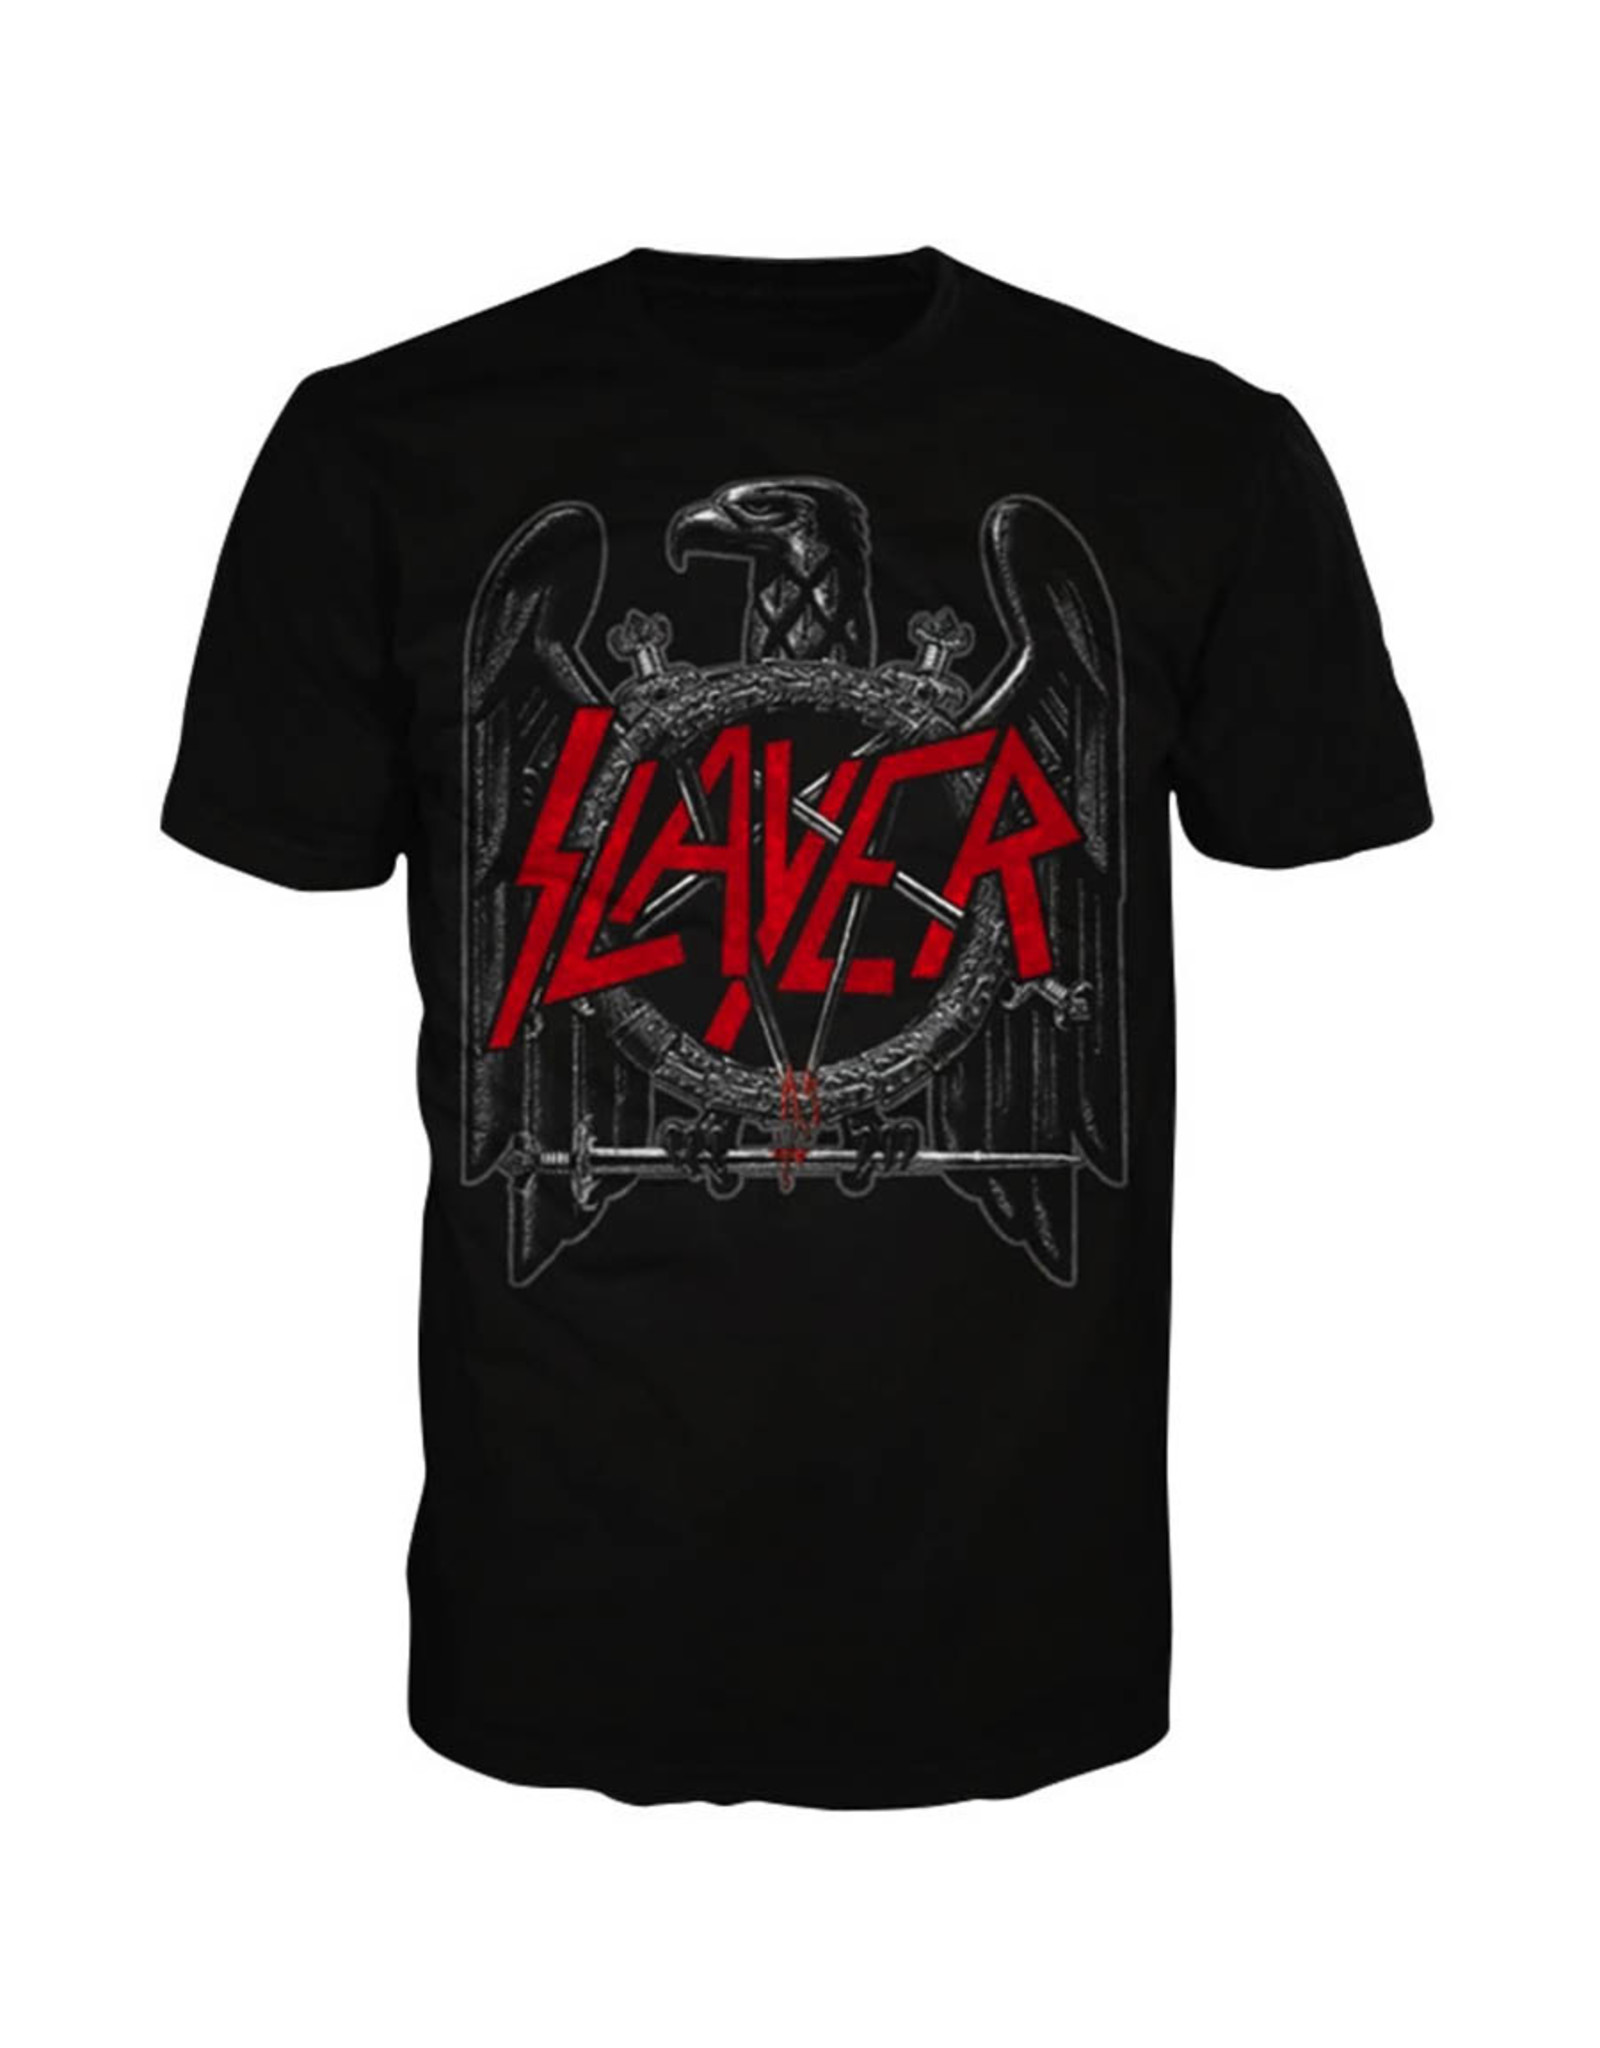 Star 500 Concert Series On Hollywood Tee Slayer Black Eagle S/S (Black)